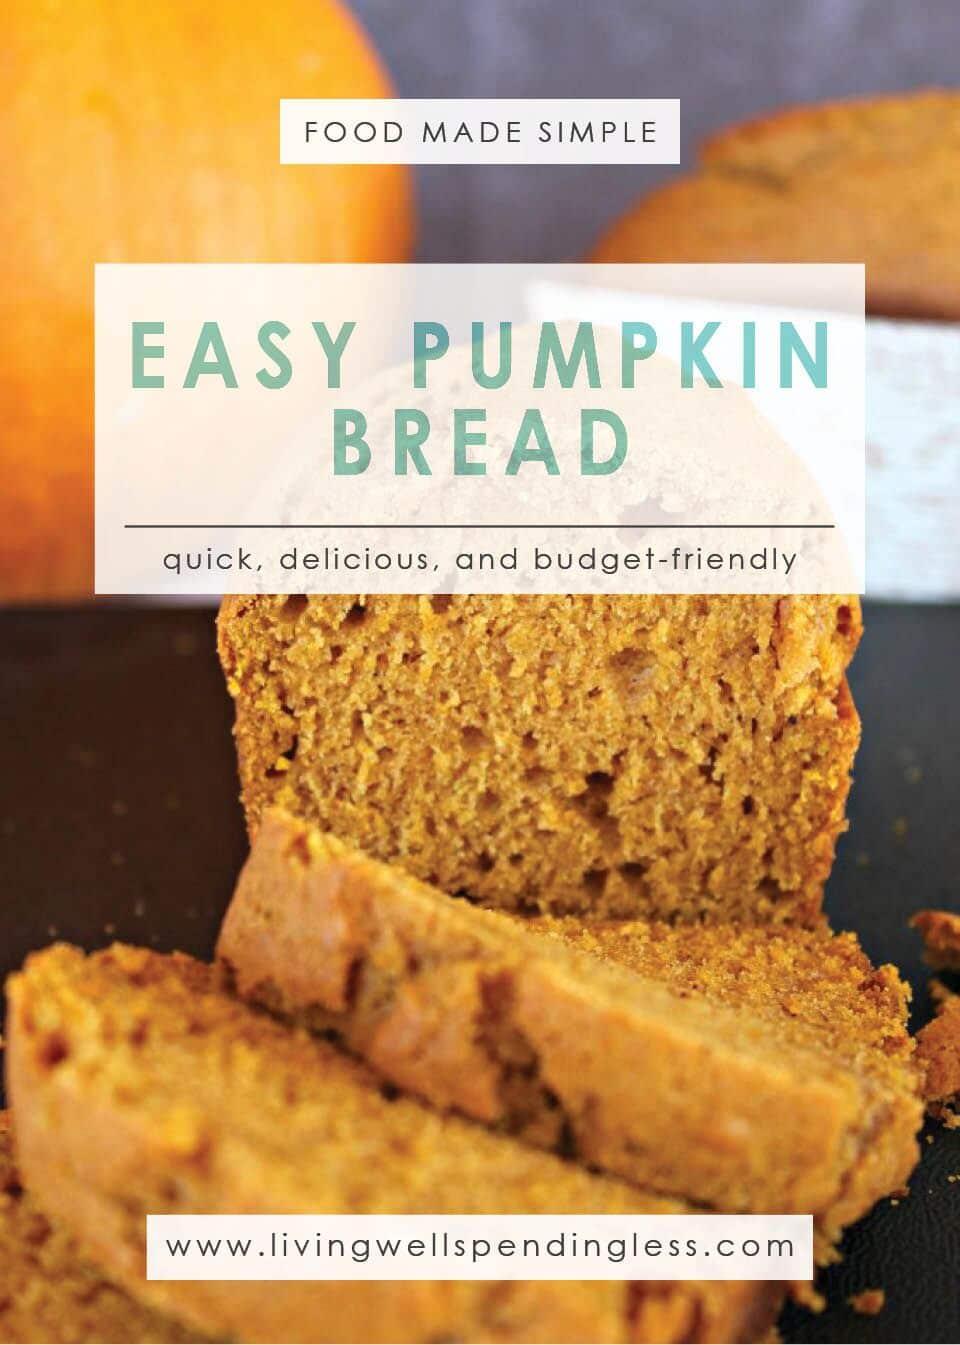 Easy Pumpkin Bread: A Quick, Delicious and Budget-Friendly recipe.